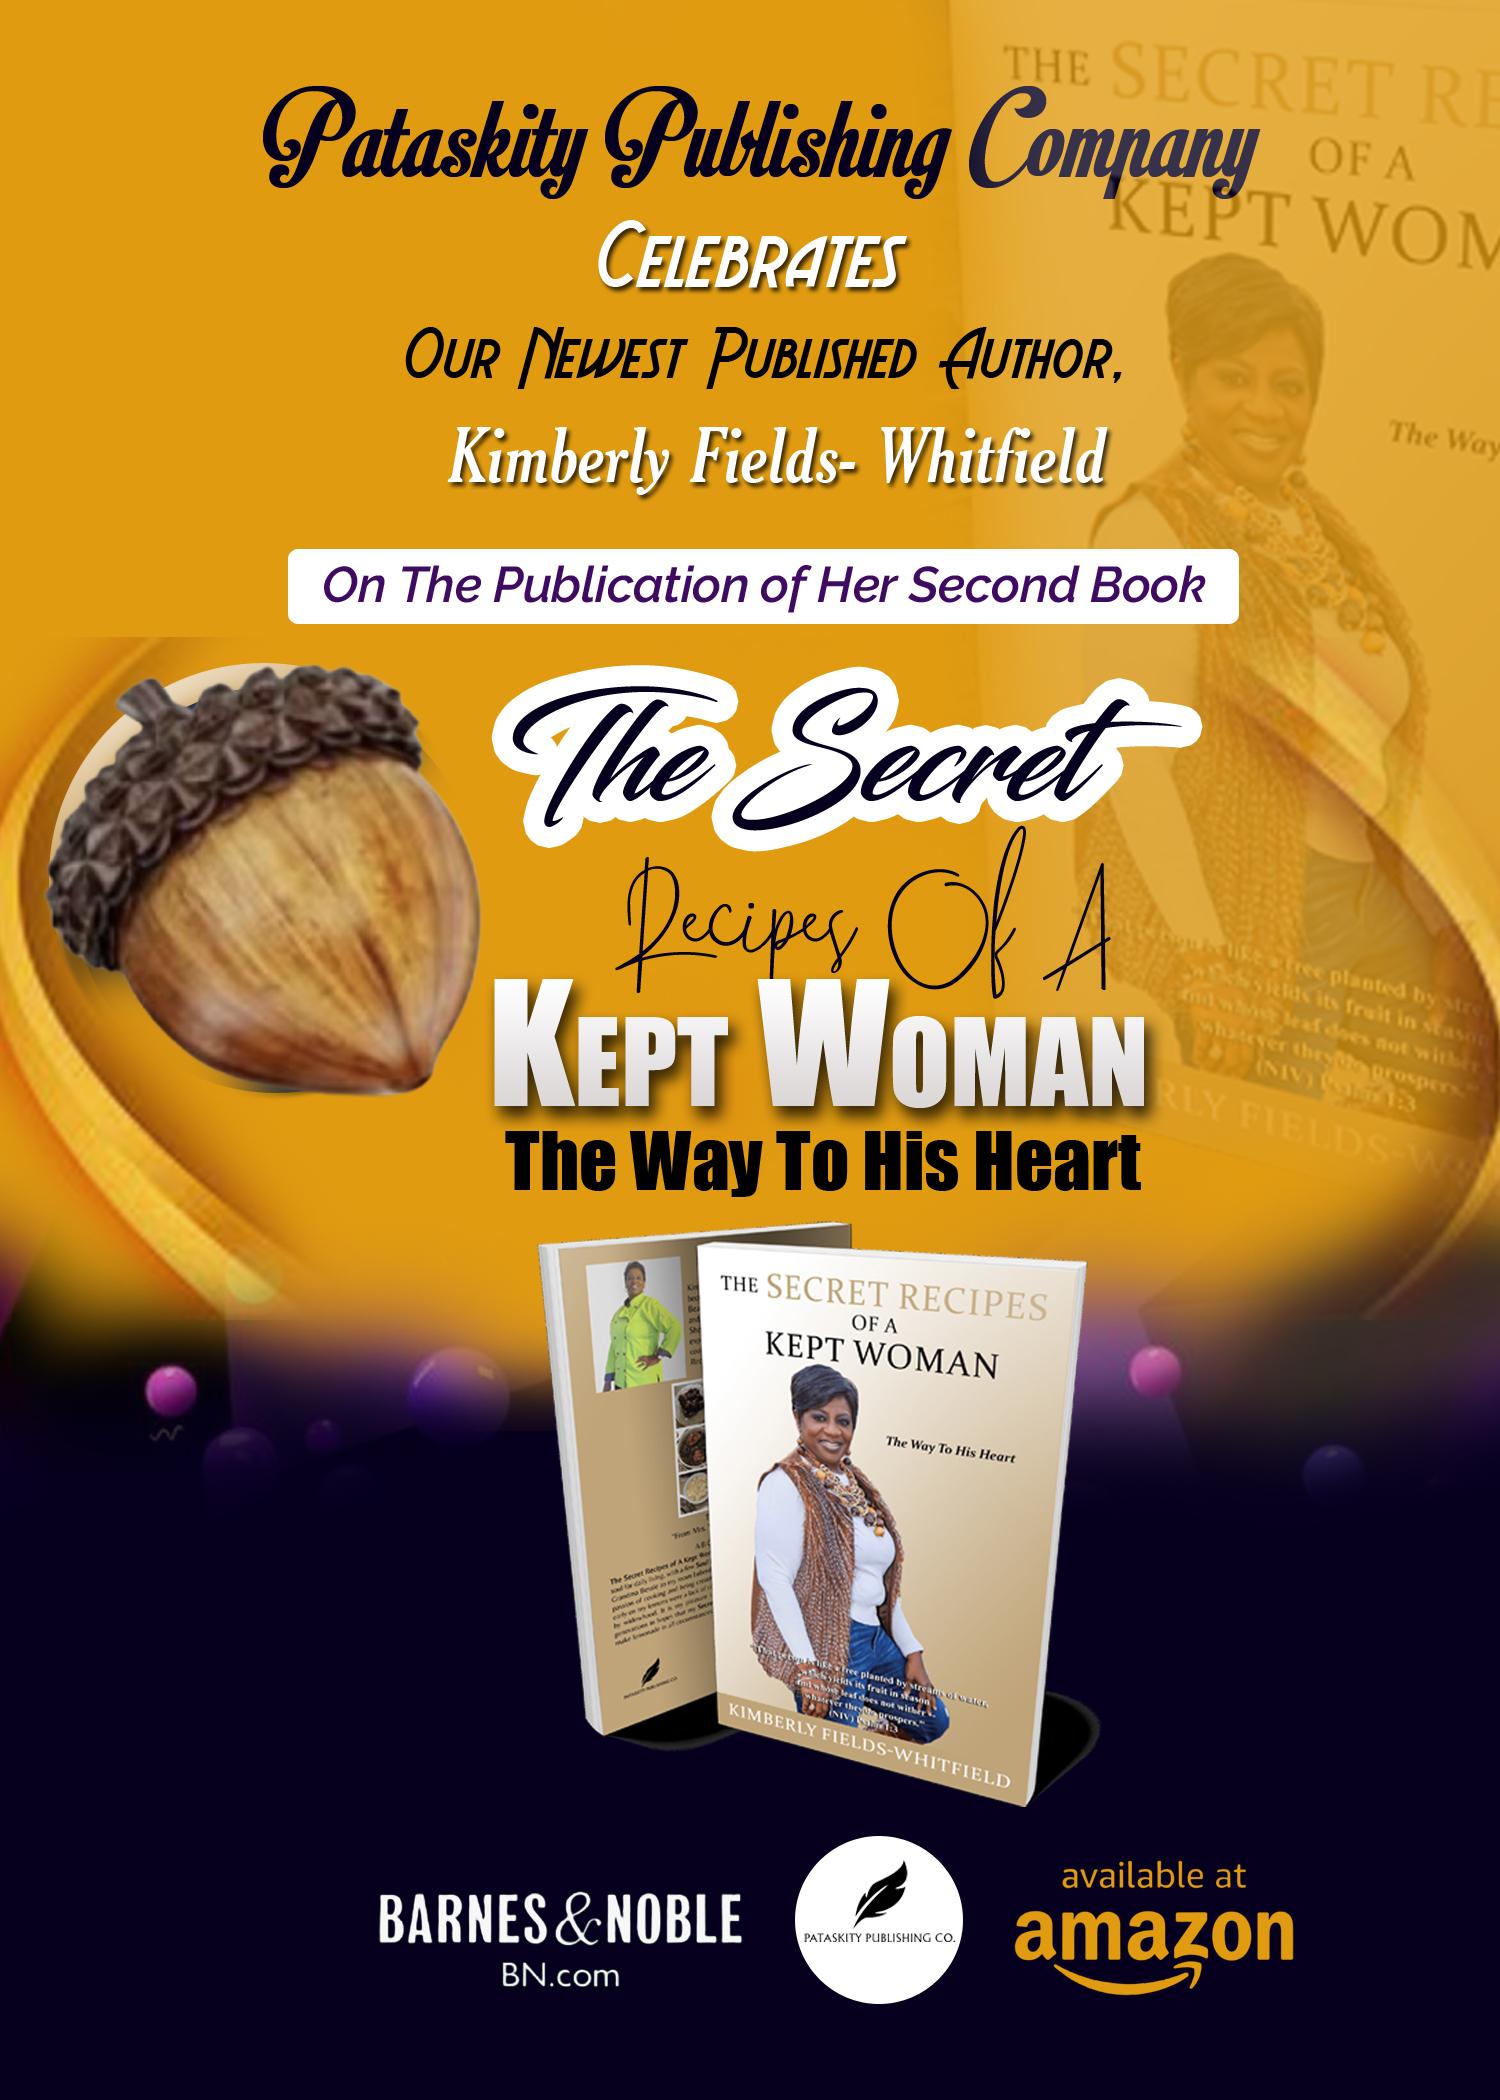 The Secret Recipes Of A Kept Woman!